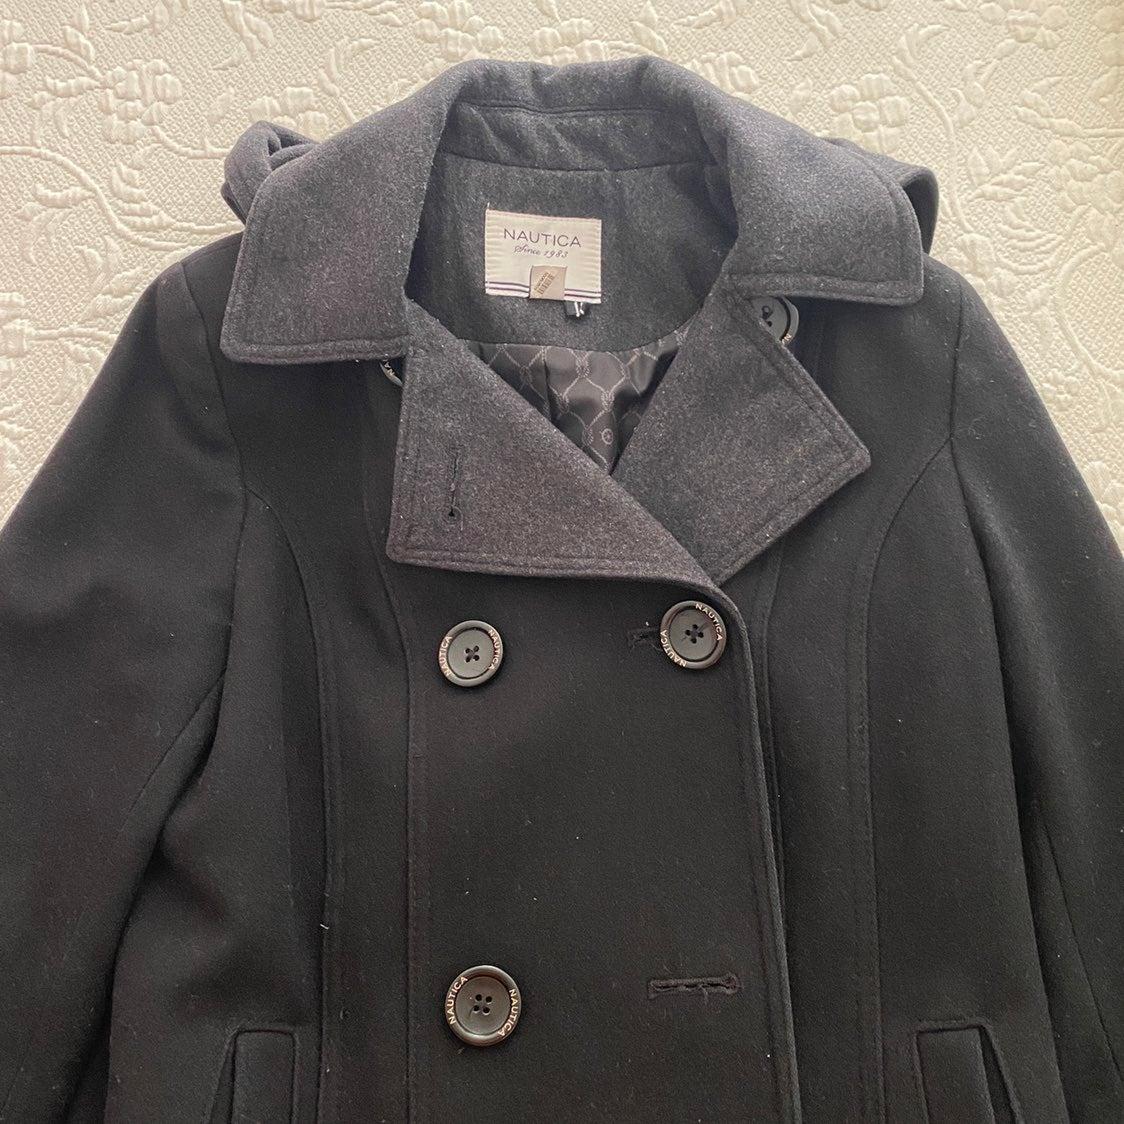 Nautica Black Wool Coat